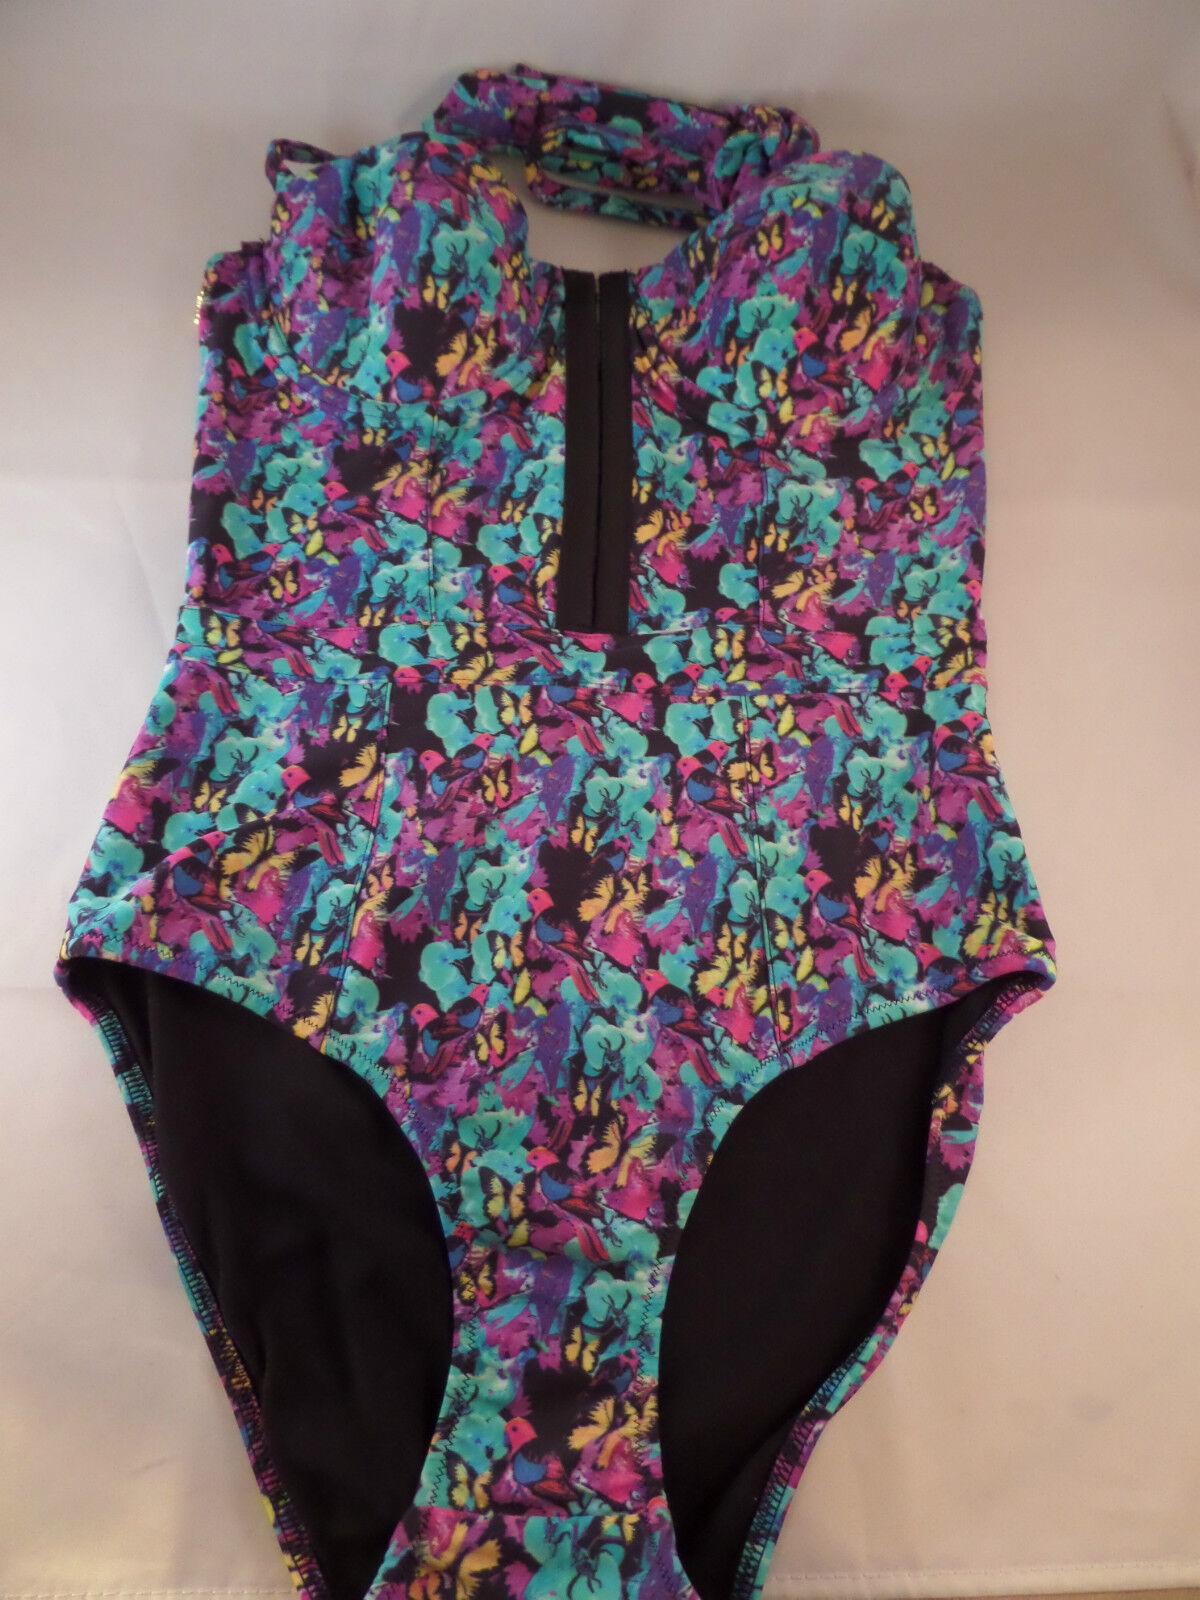 NWT Playful Promises Exotic Parred 1pc Swimsuit  size 6(UK)